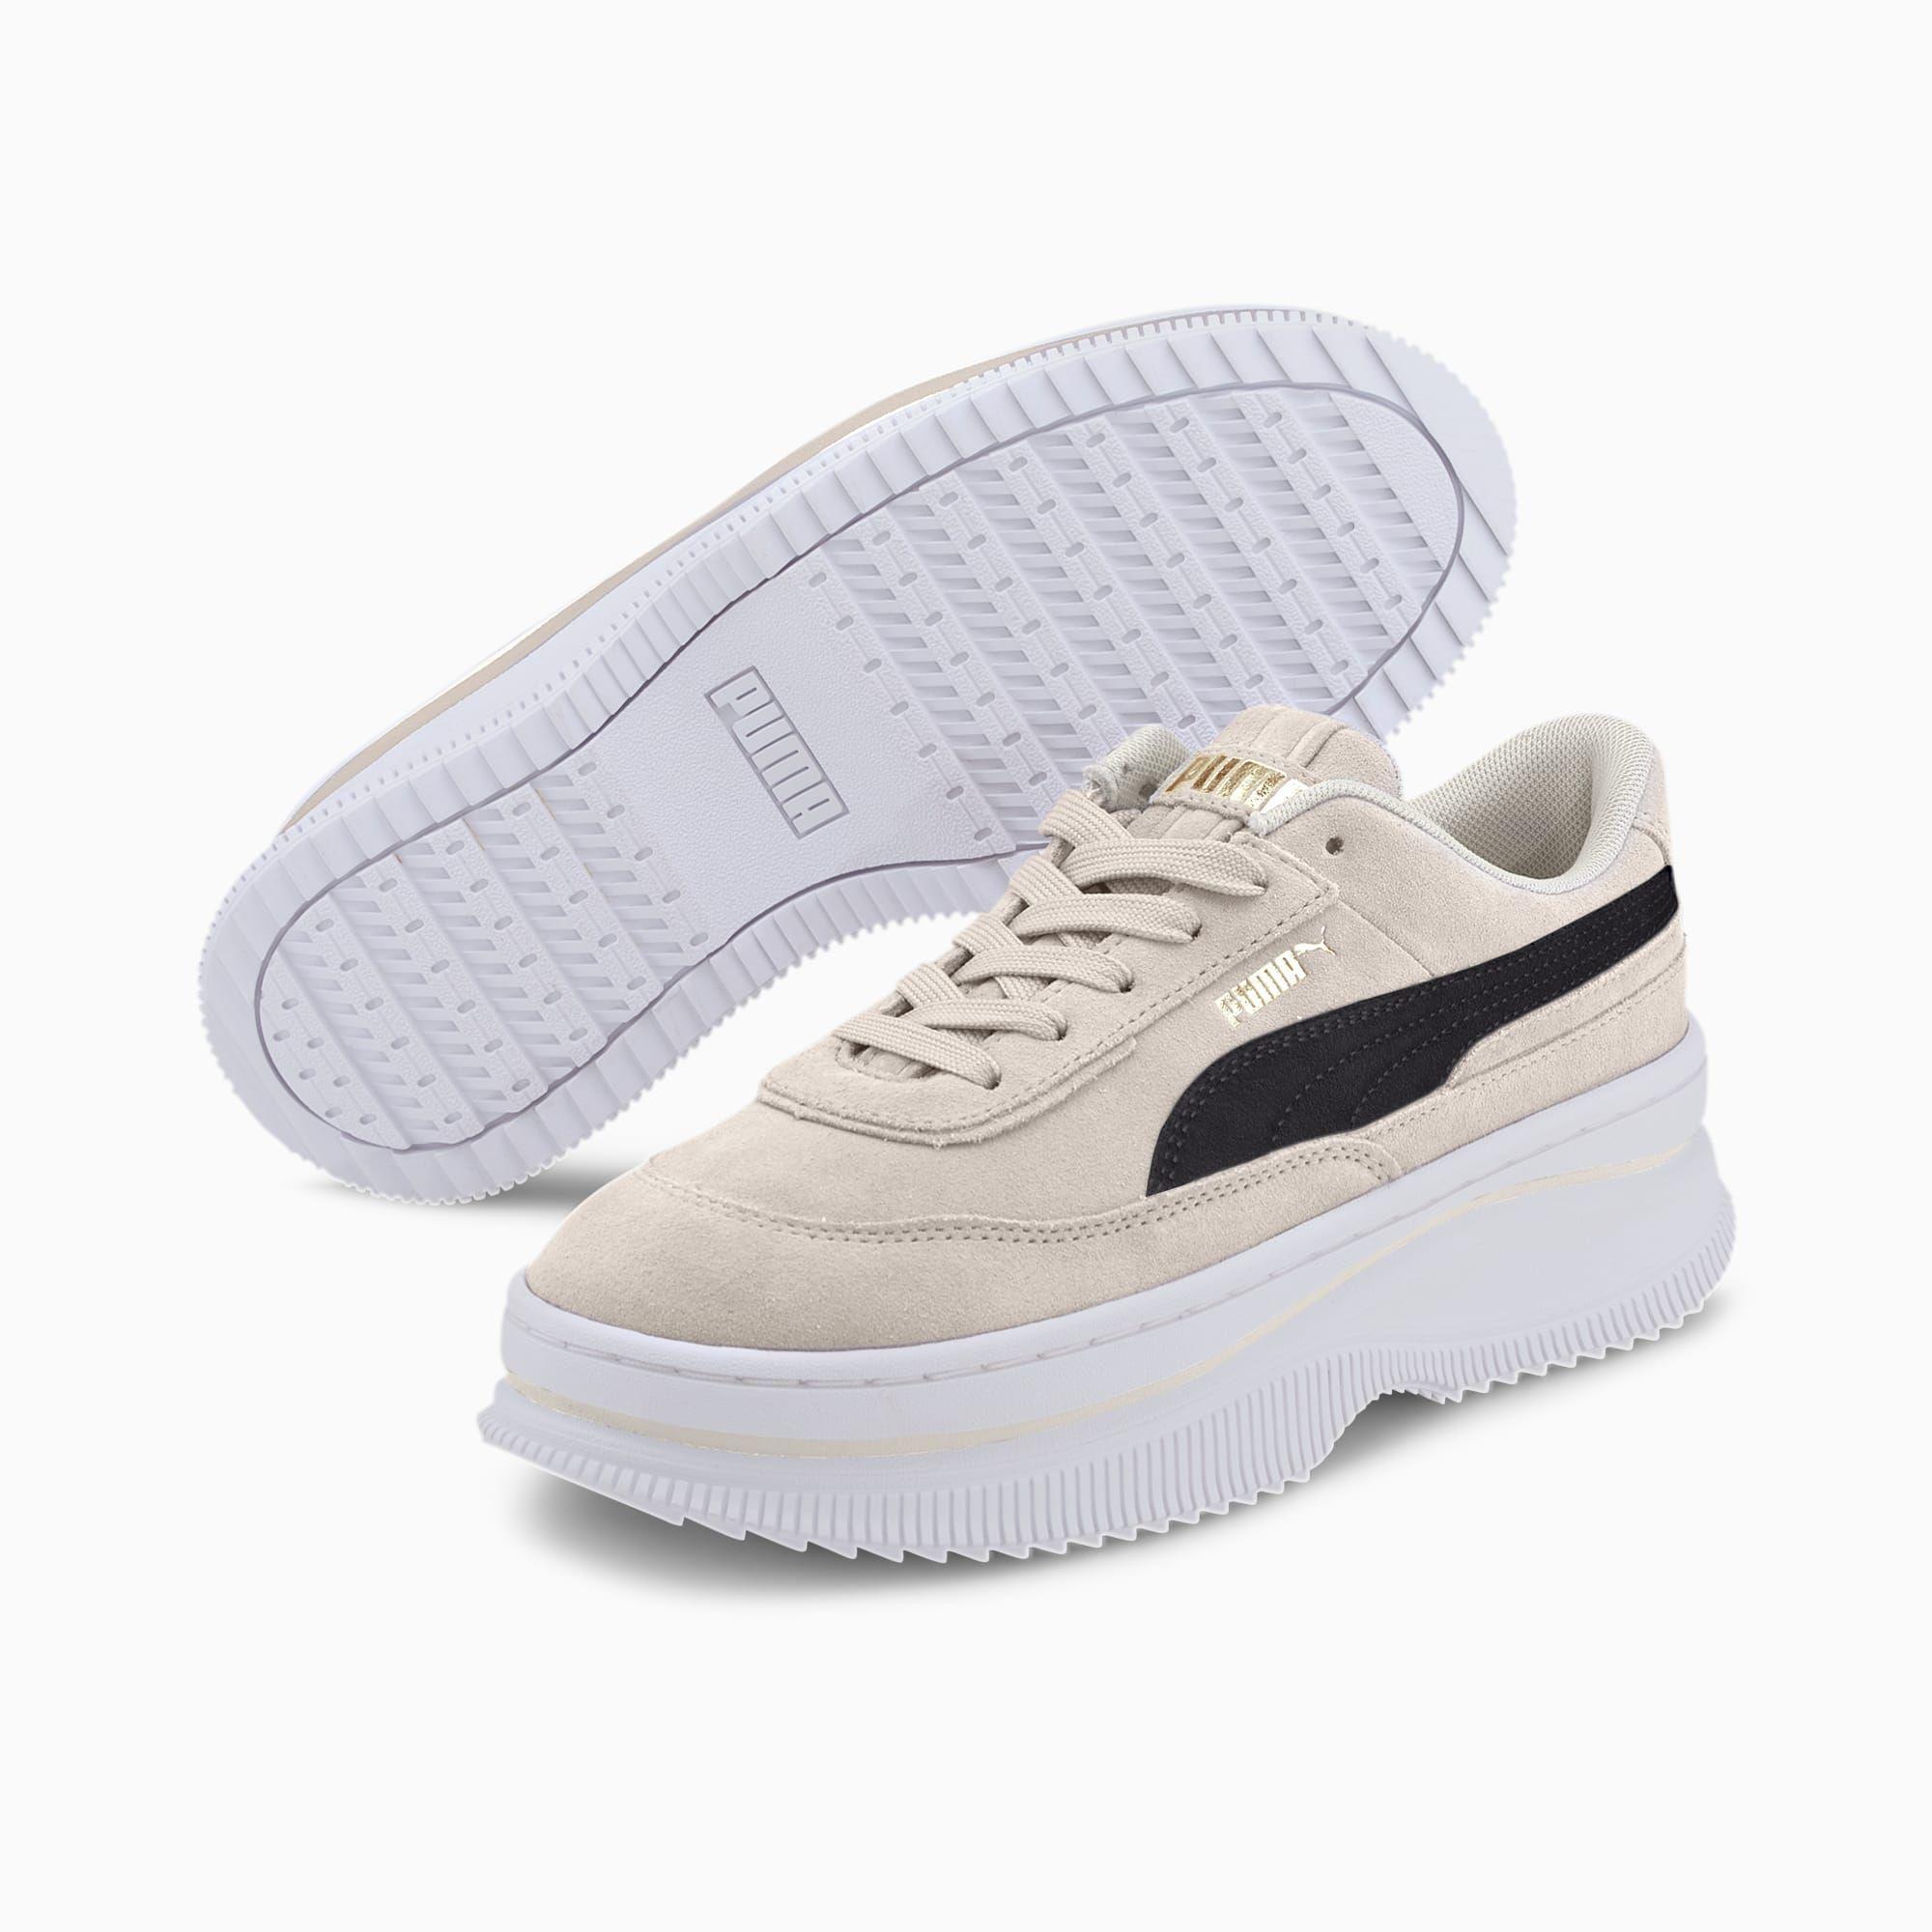 Puma Deva Wildleder Damen Turnschuhe Marshmallow Schwarz Grosse 4 Schuhe In 2020